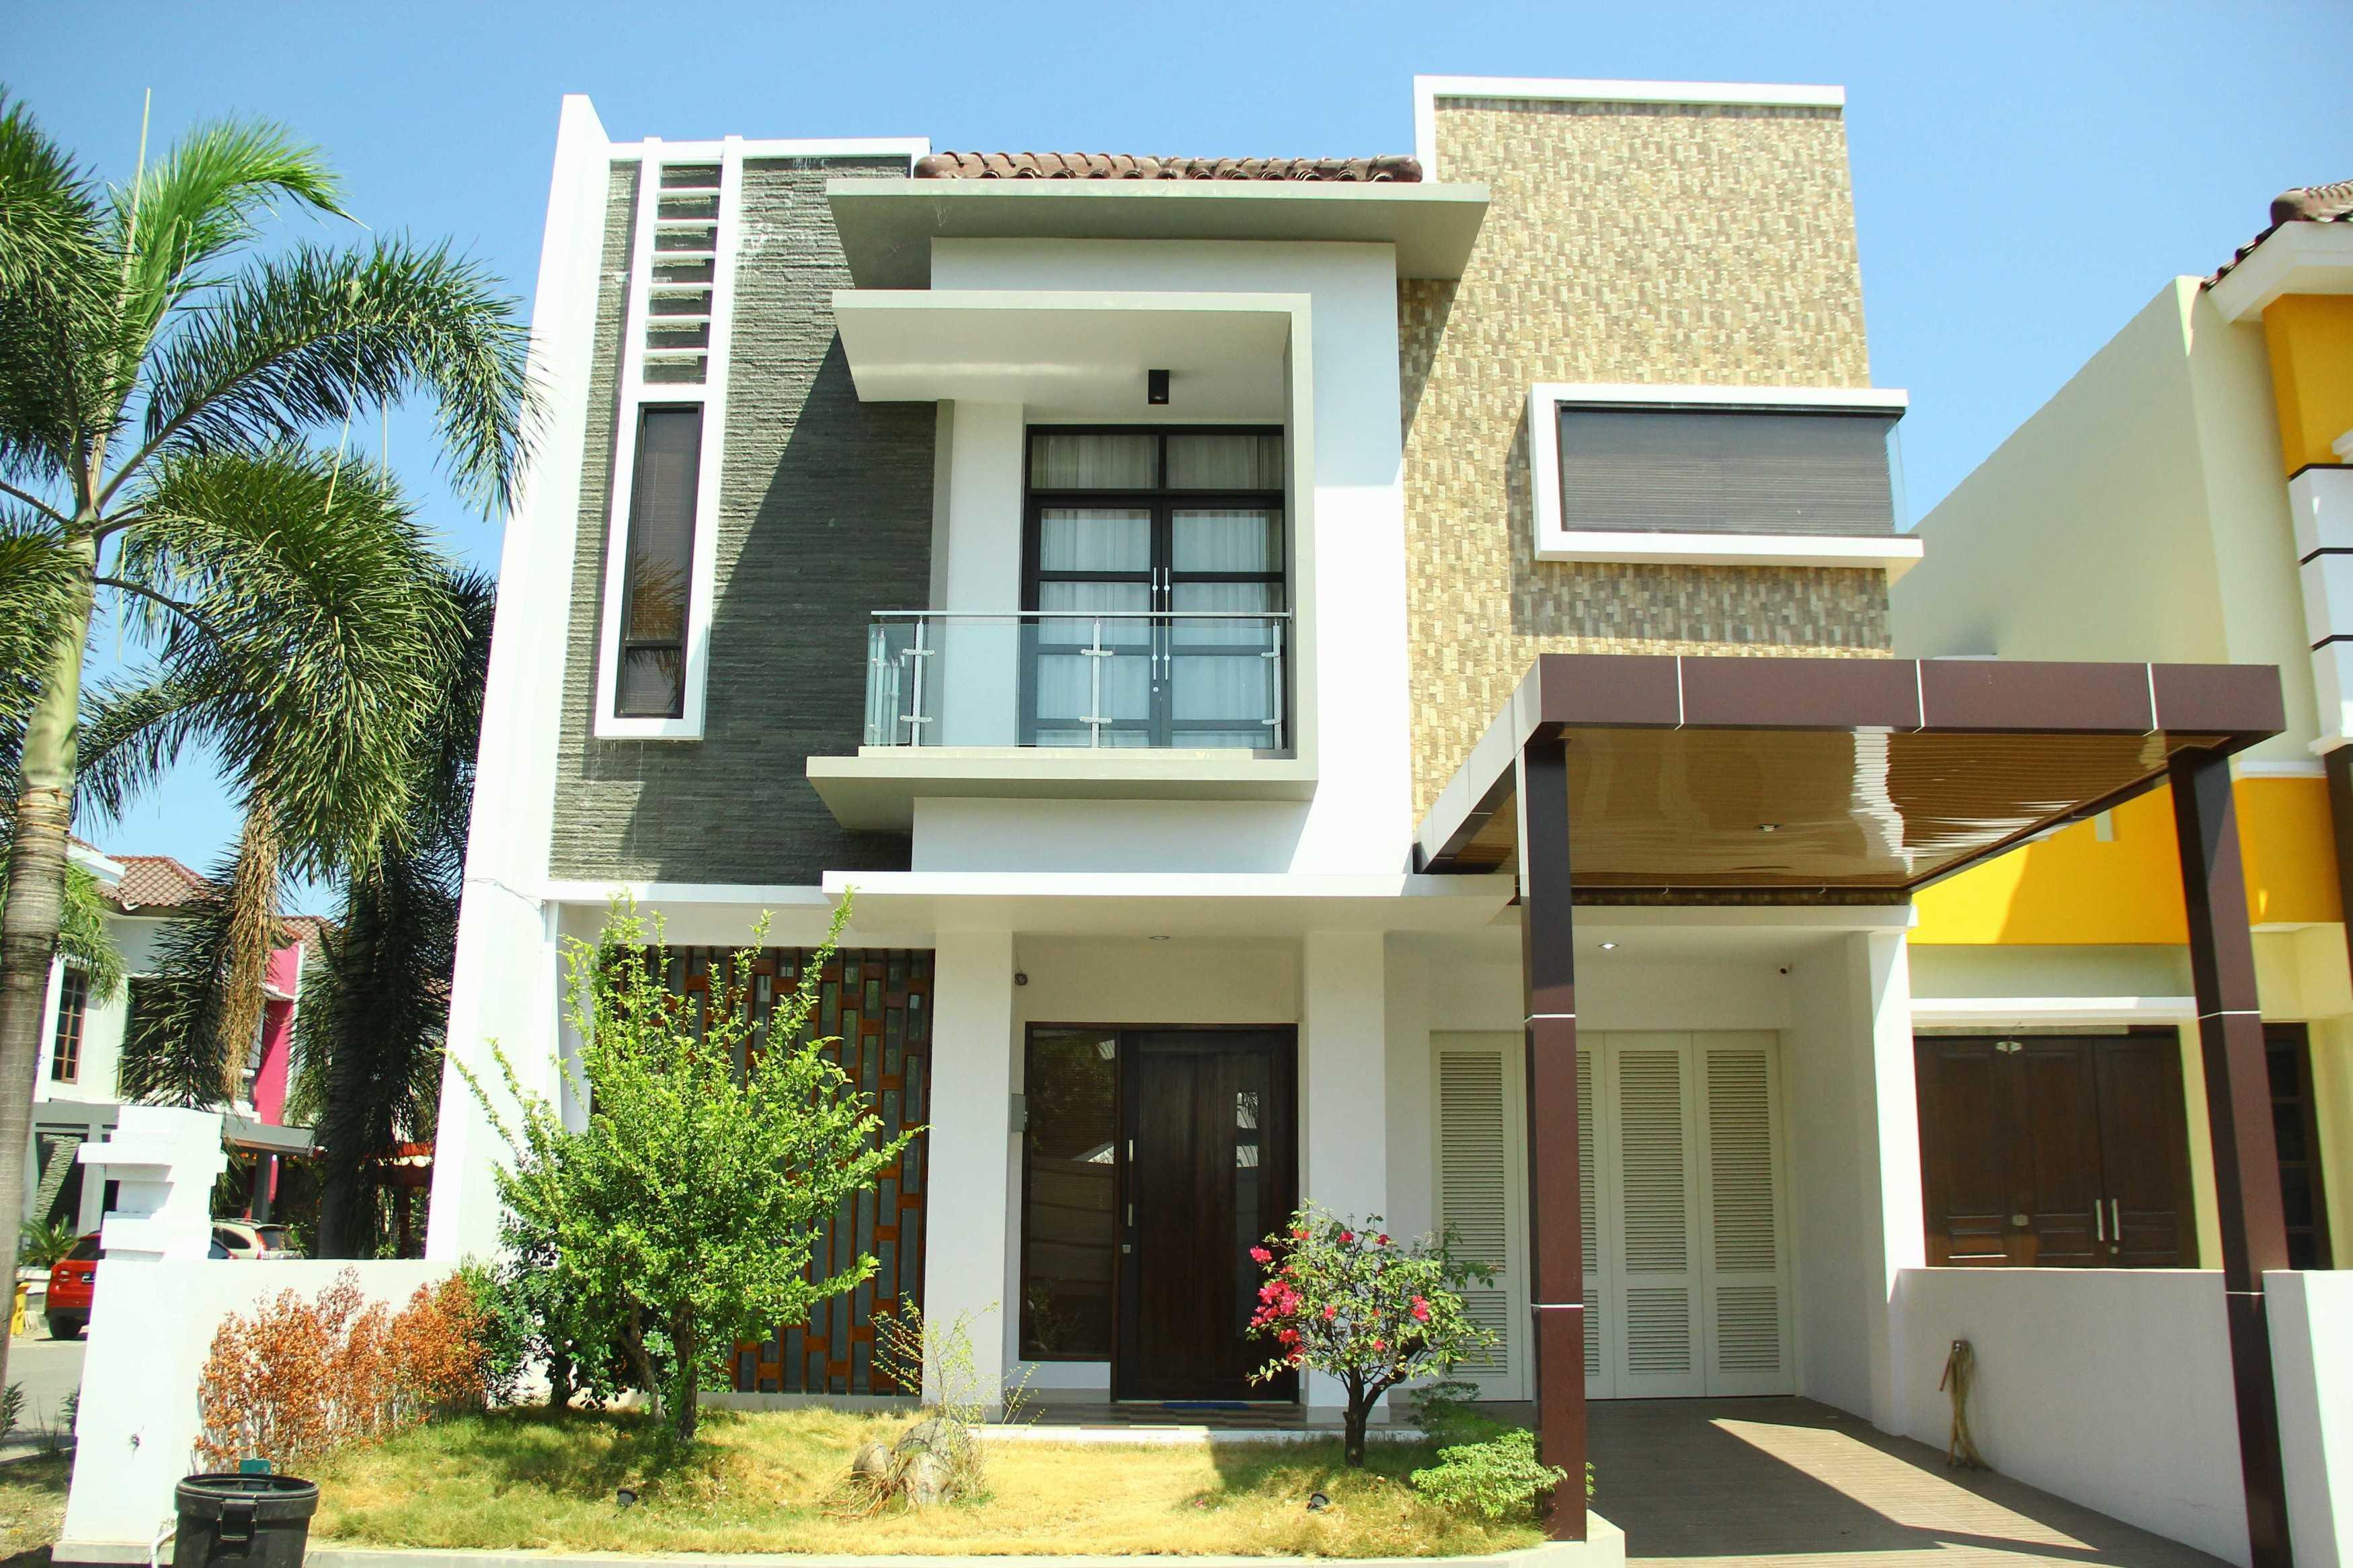 Miv Architects (Ar. Muhammad Ikhsan Hamiru, Iai & Partners) Desain Rehabilitasi Rumah Phinisi Makassar   With Pt.dap Makassar Makassar Img1341 Modern  25584